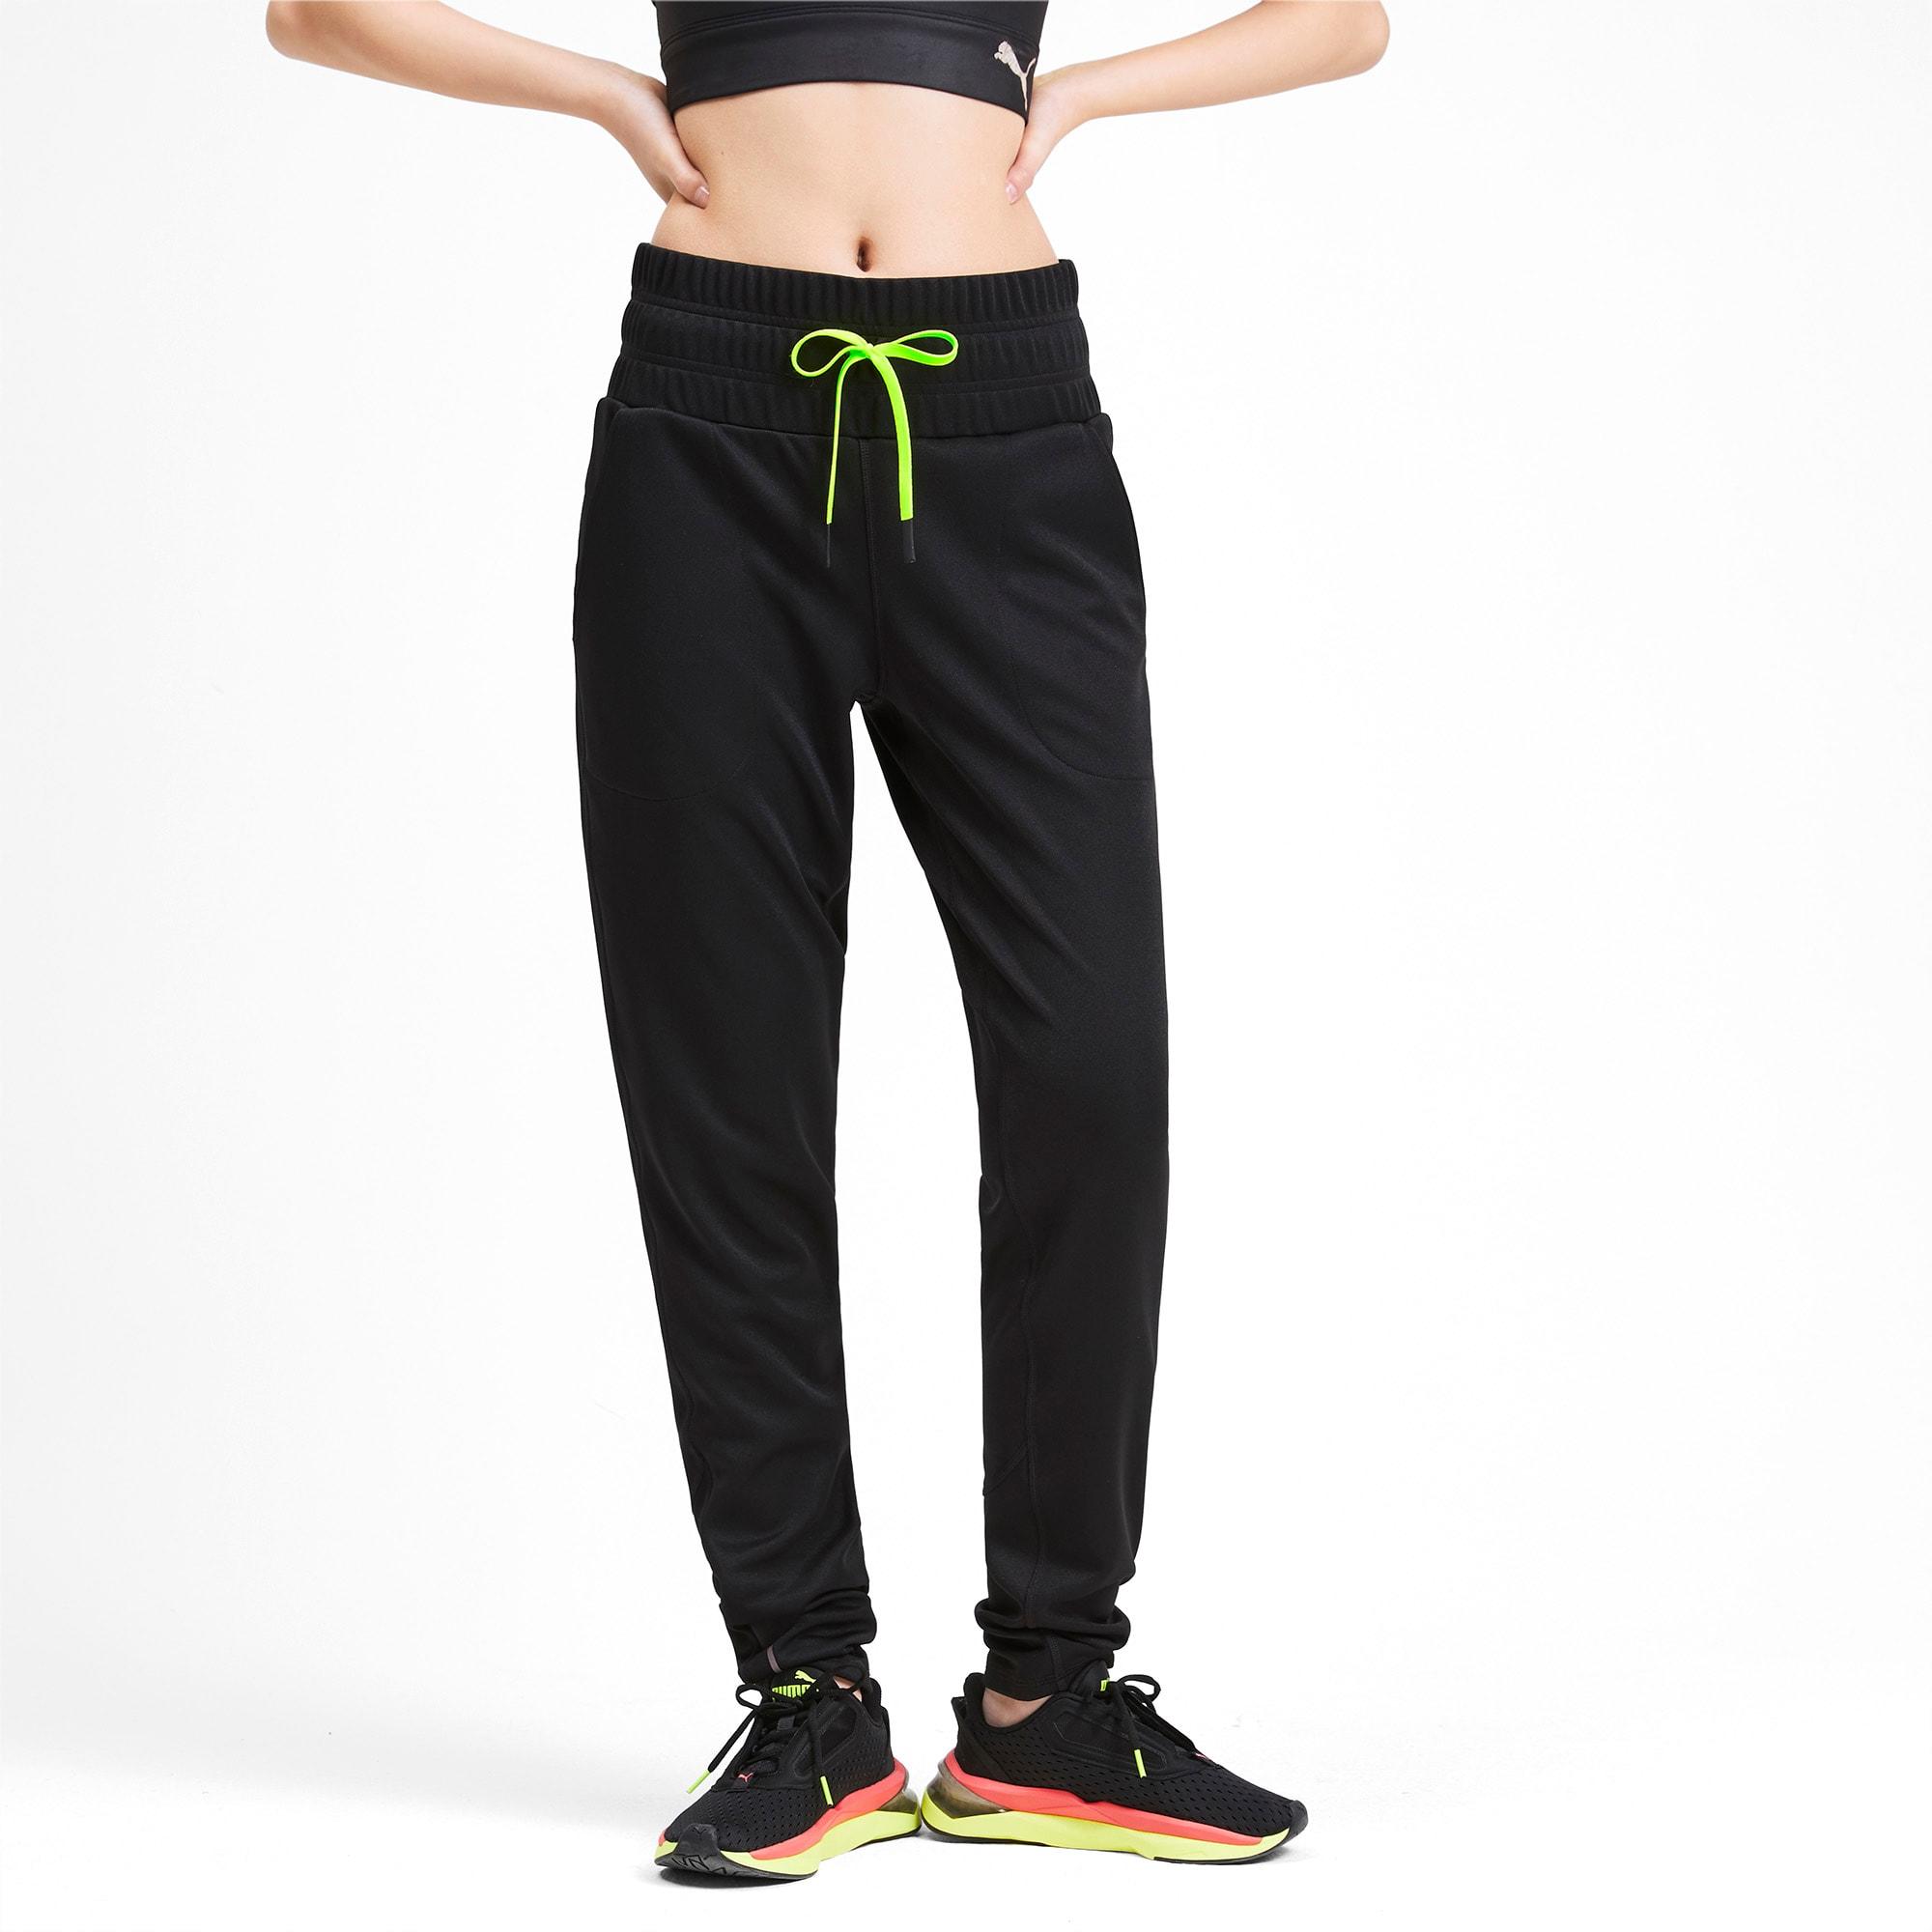 SHIFT Damen Training Gestrickte Sweatpants